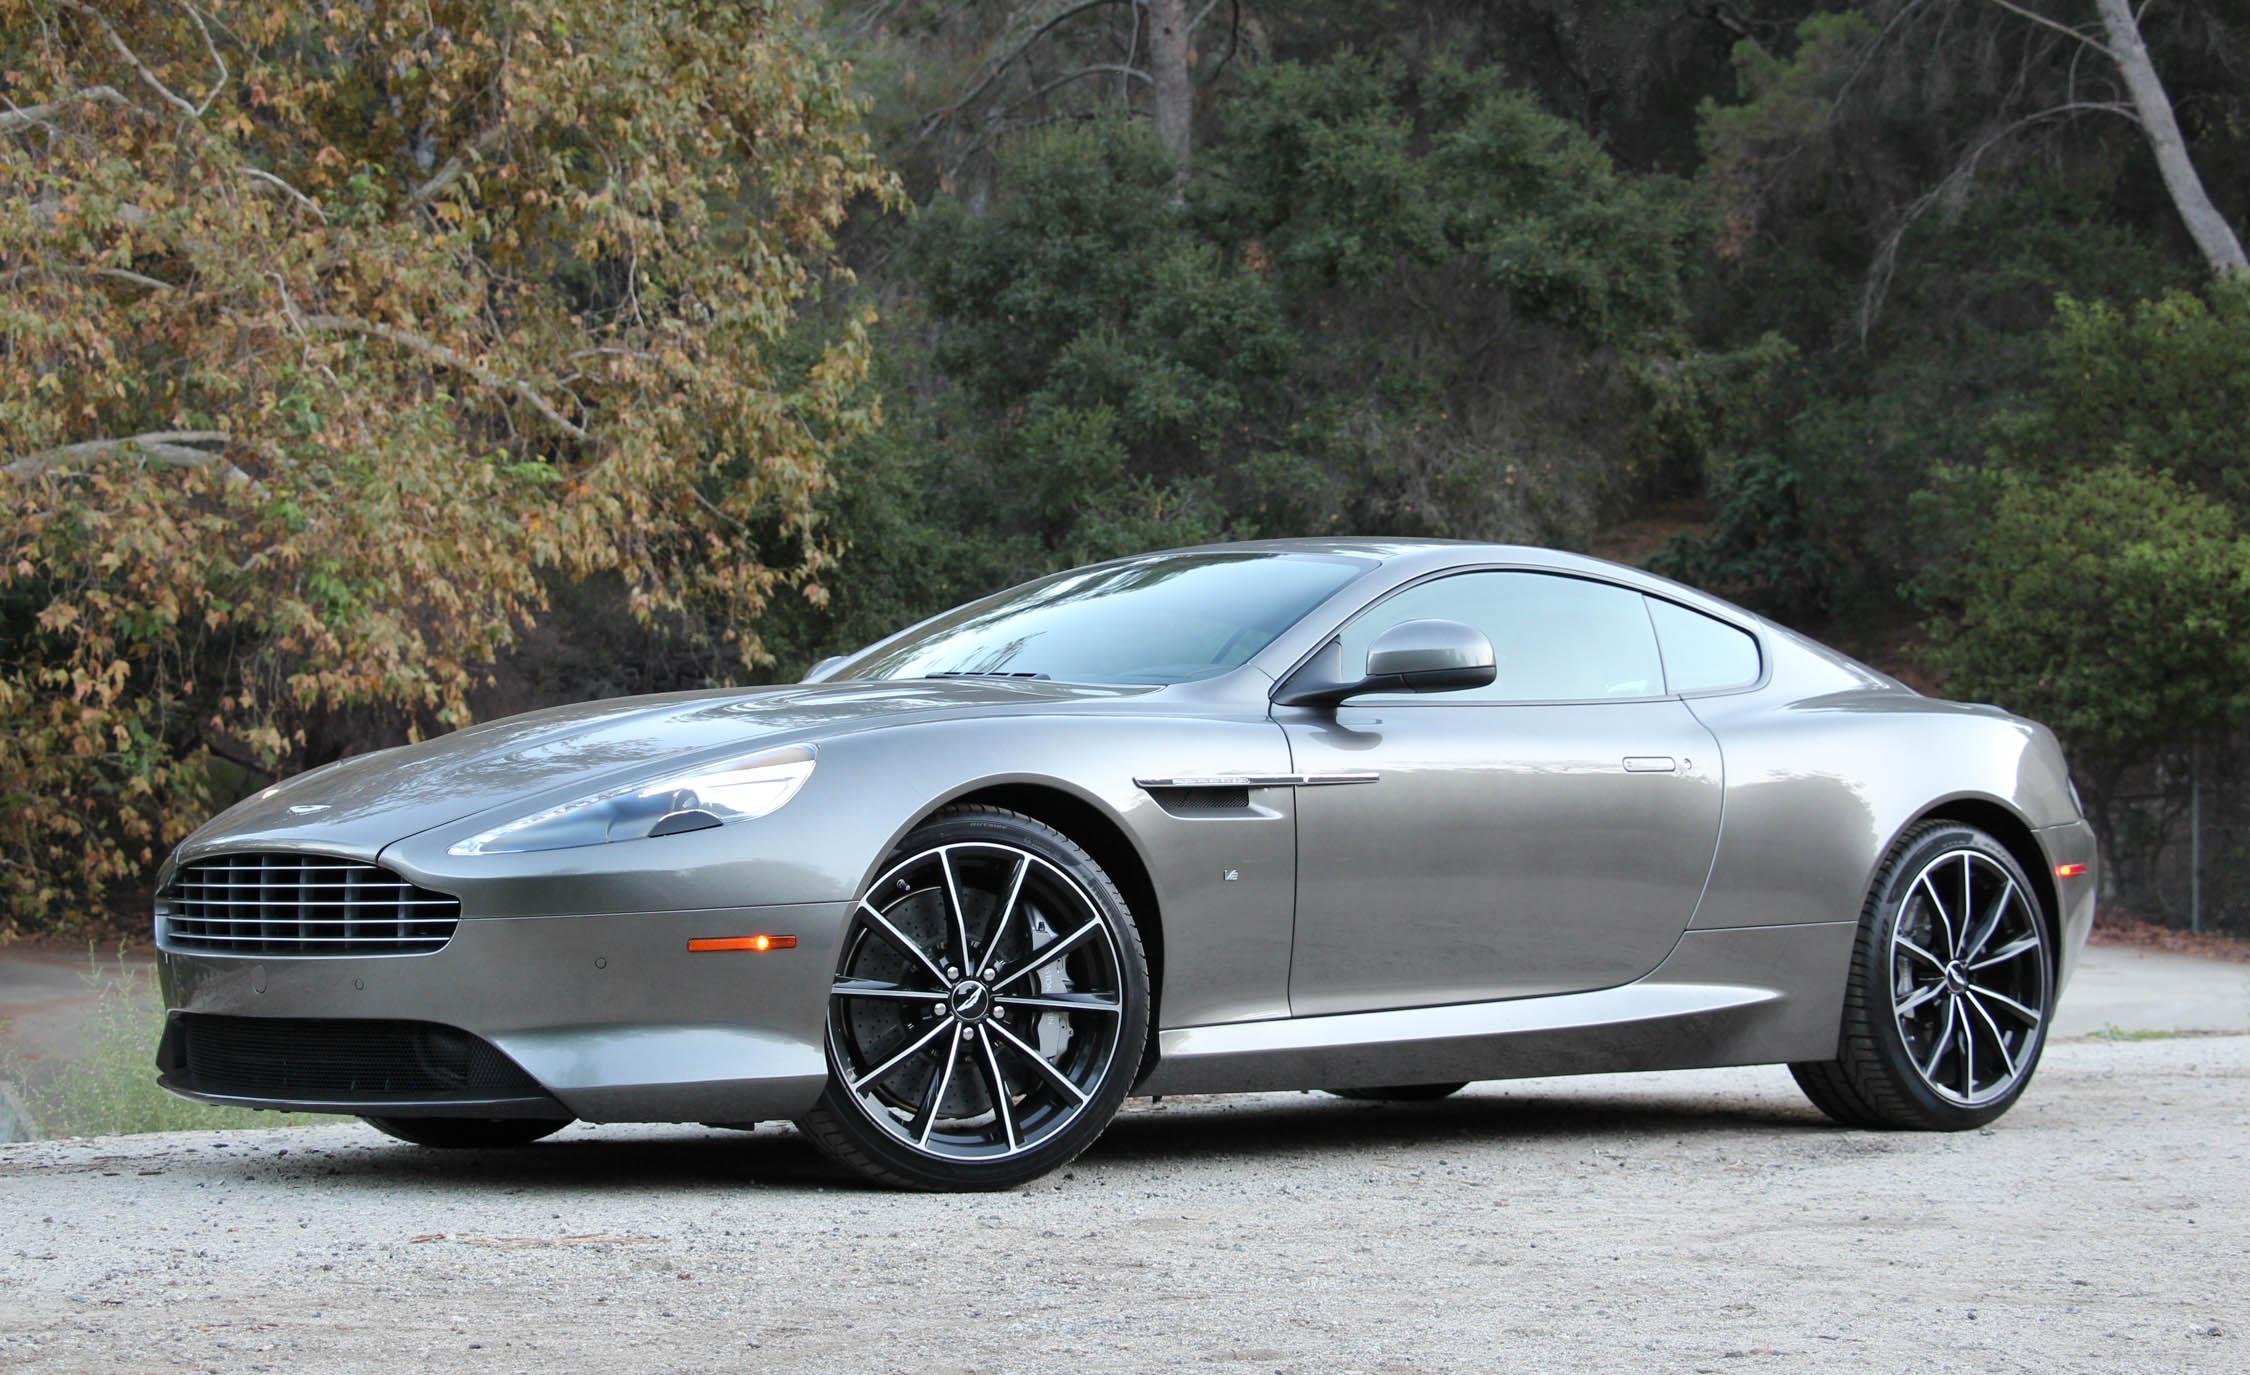 2016 Aston Martin DB9 GT (View 8 of 18)